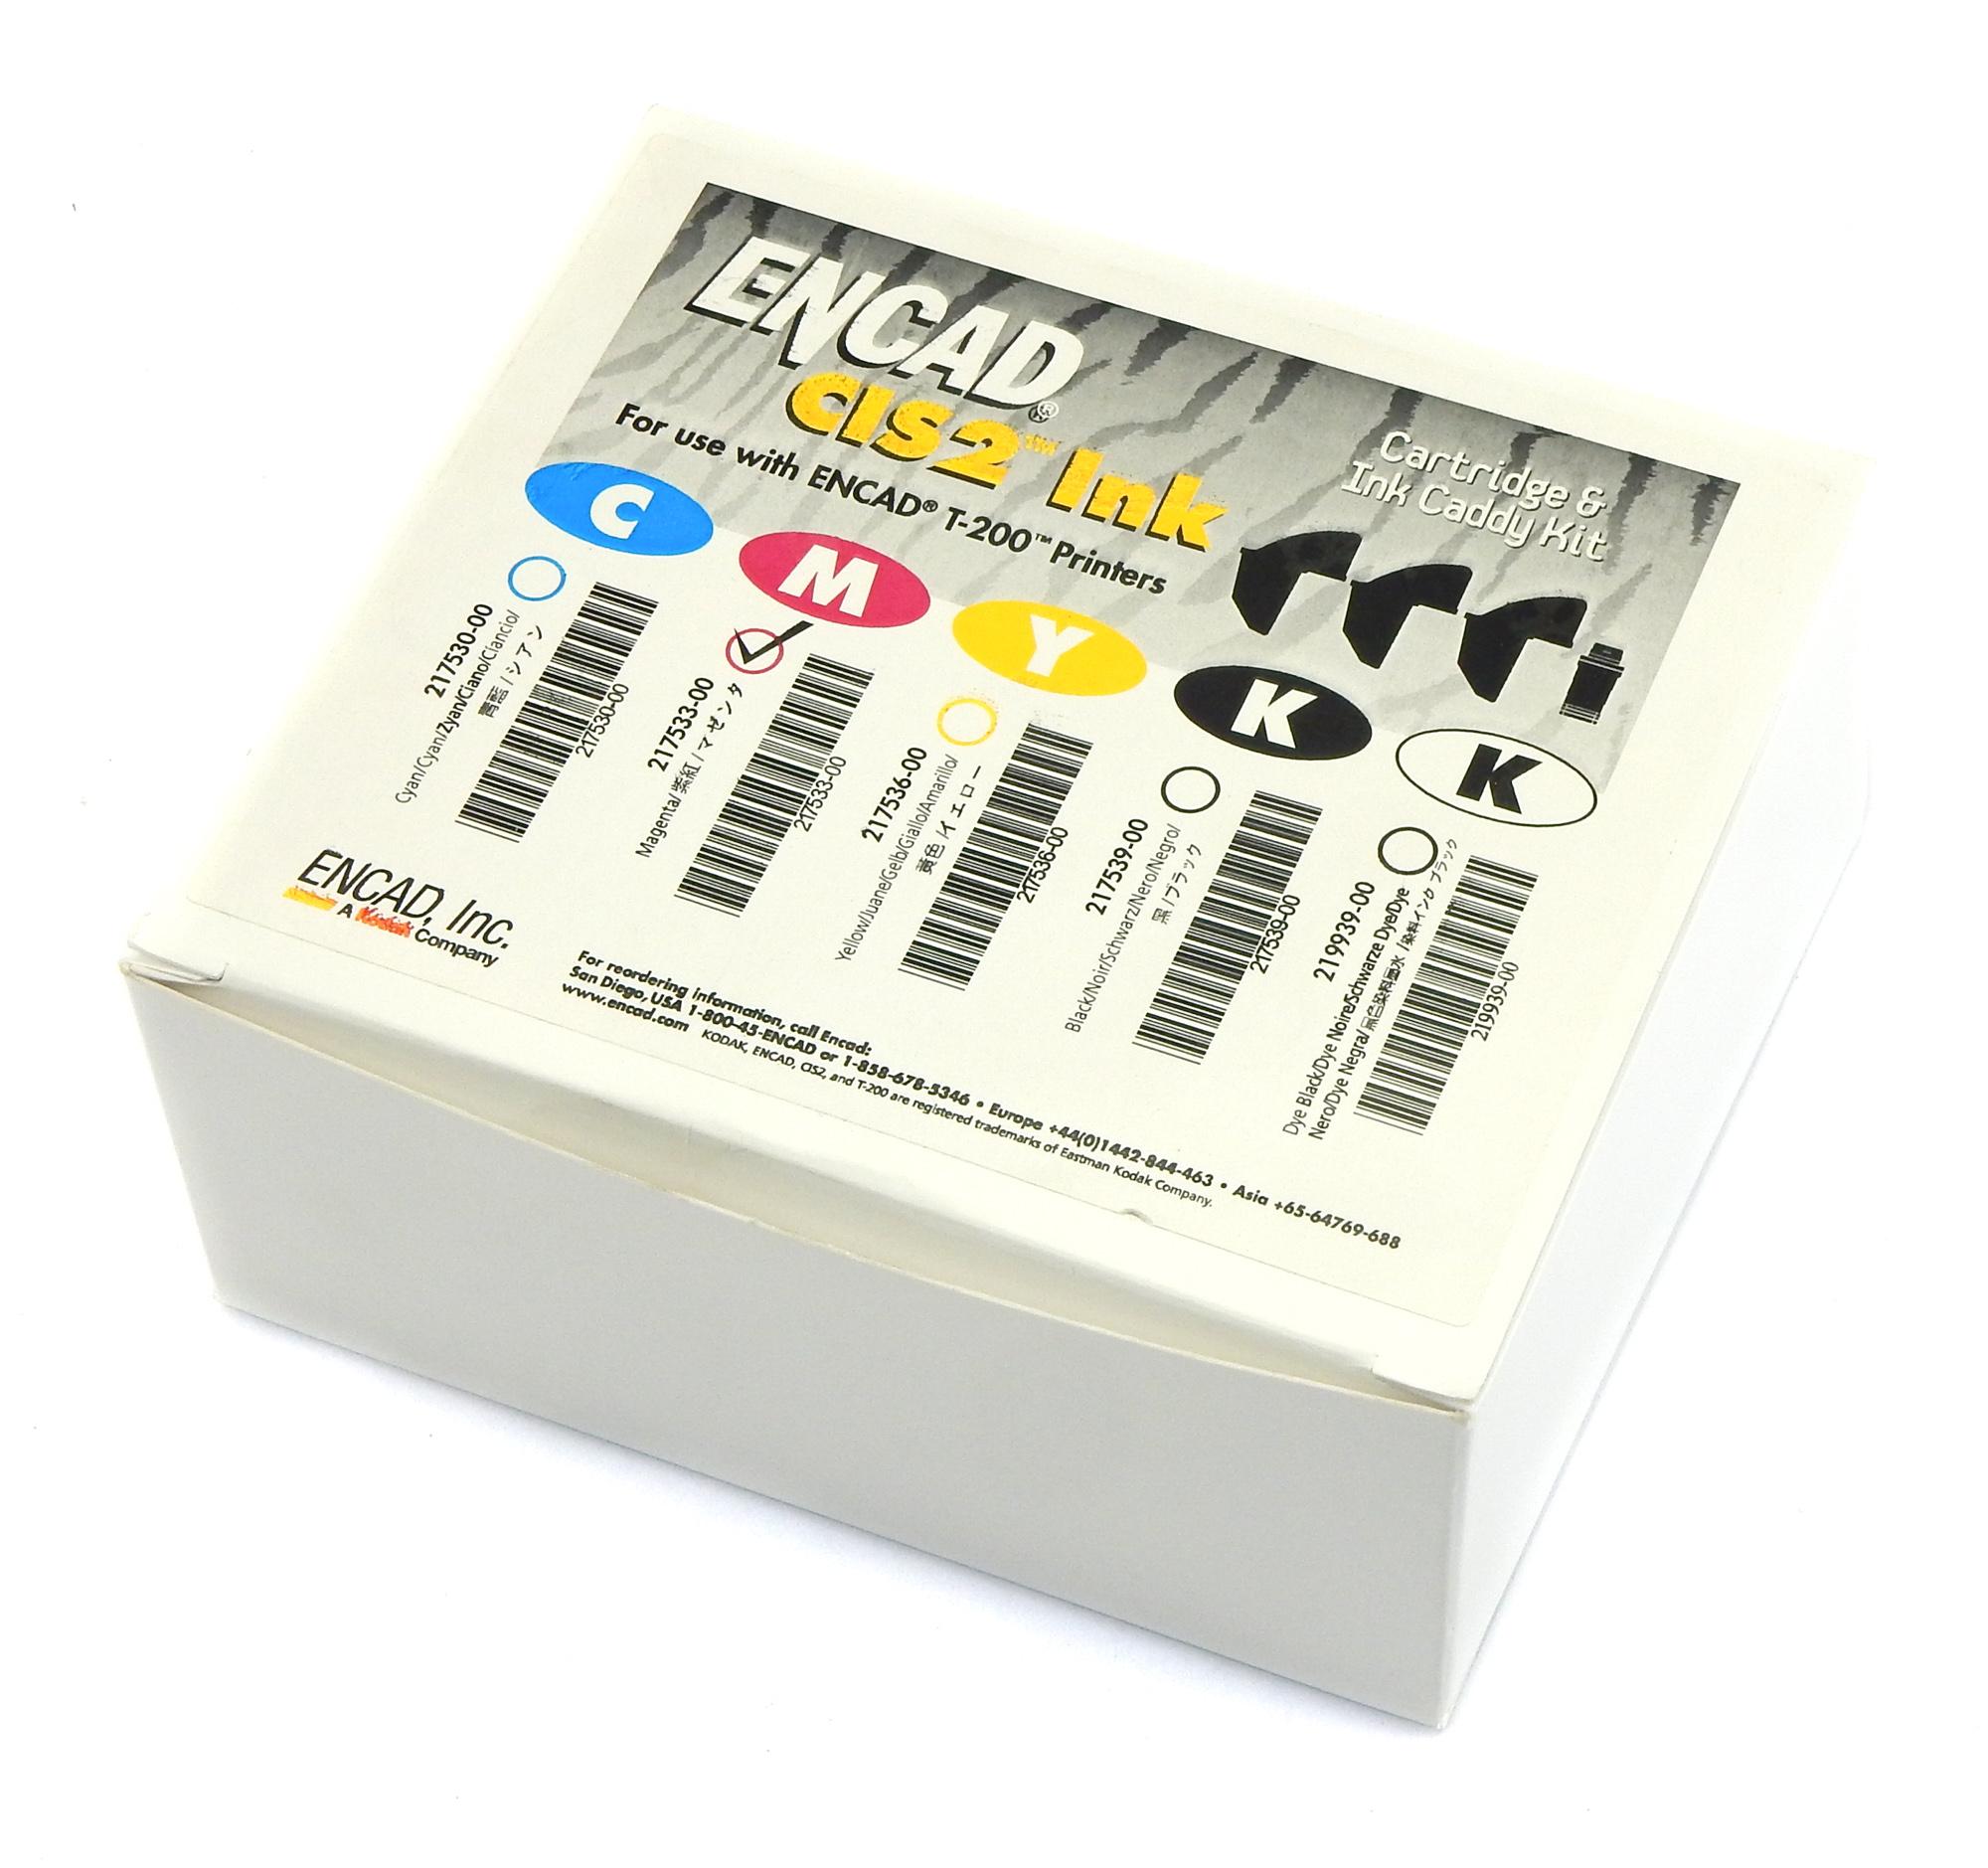 Genuine ENCAD 217533-00 CIS2 Cartridge & Ink Caddy Kit - Magenta